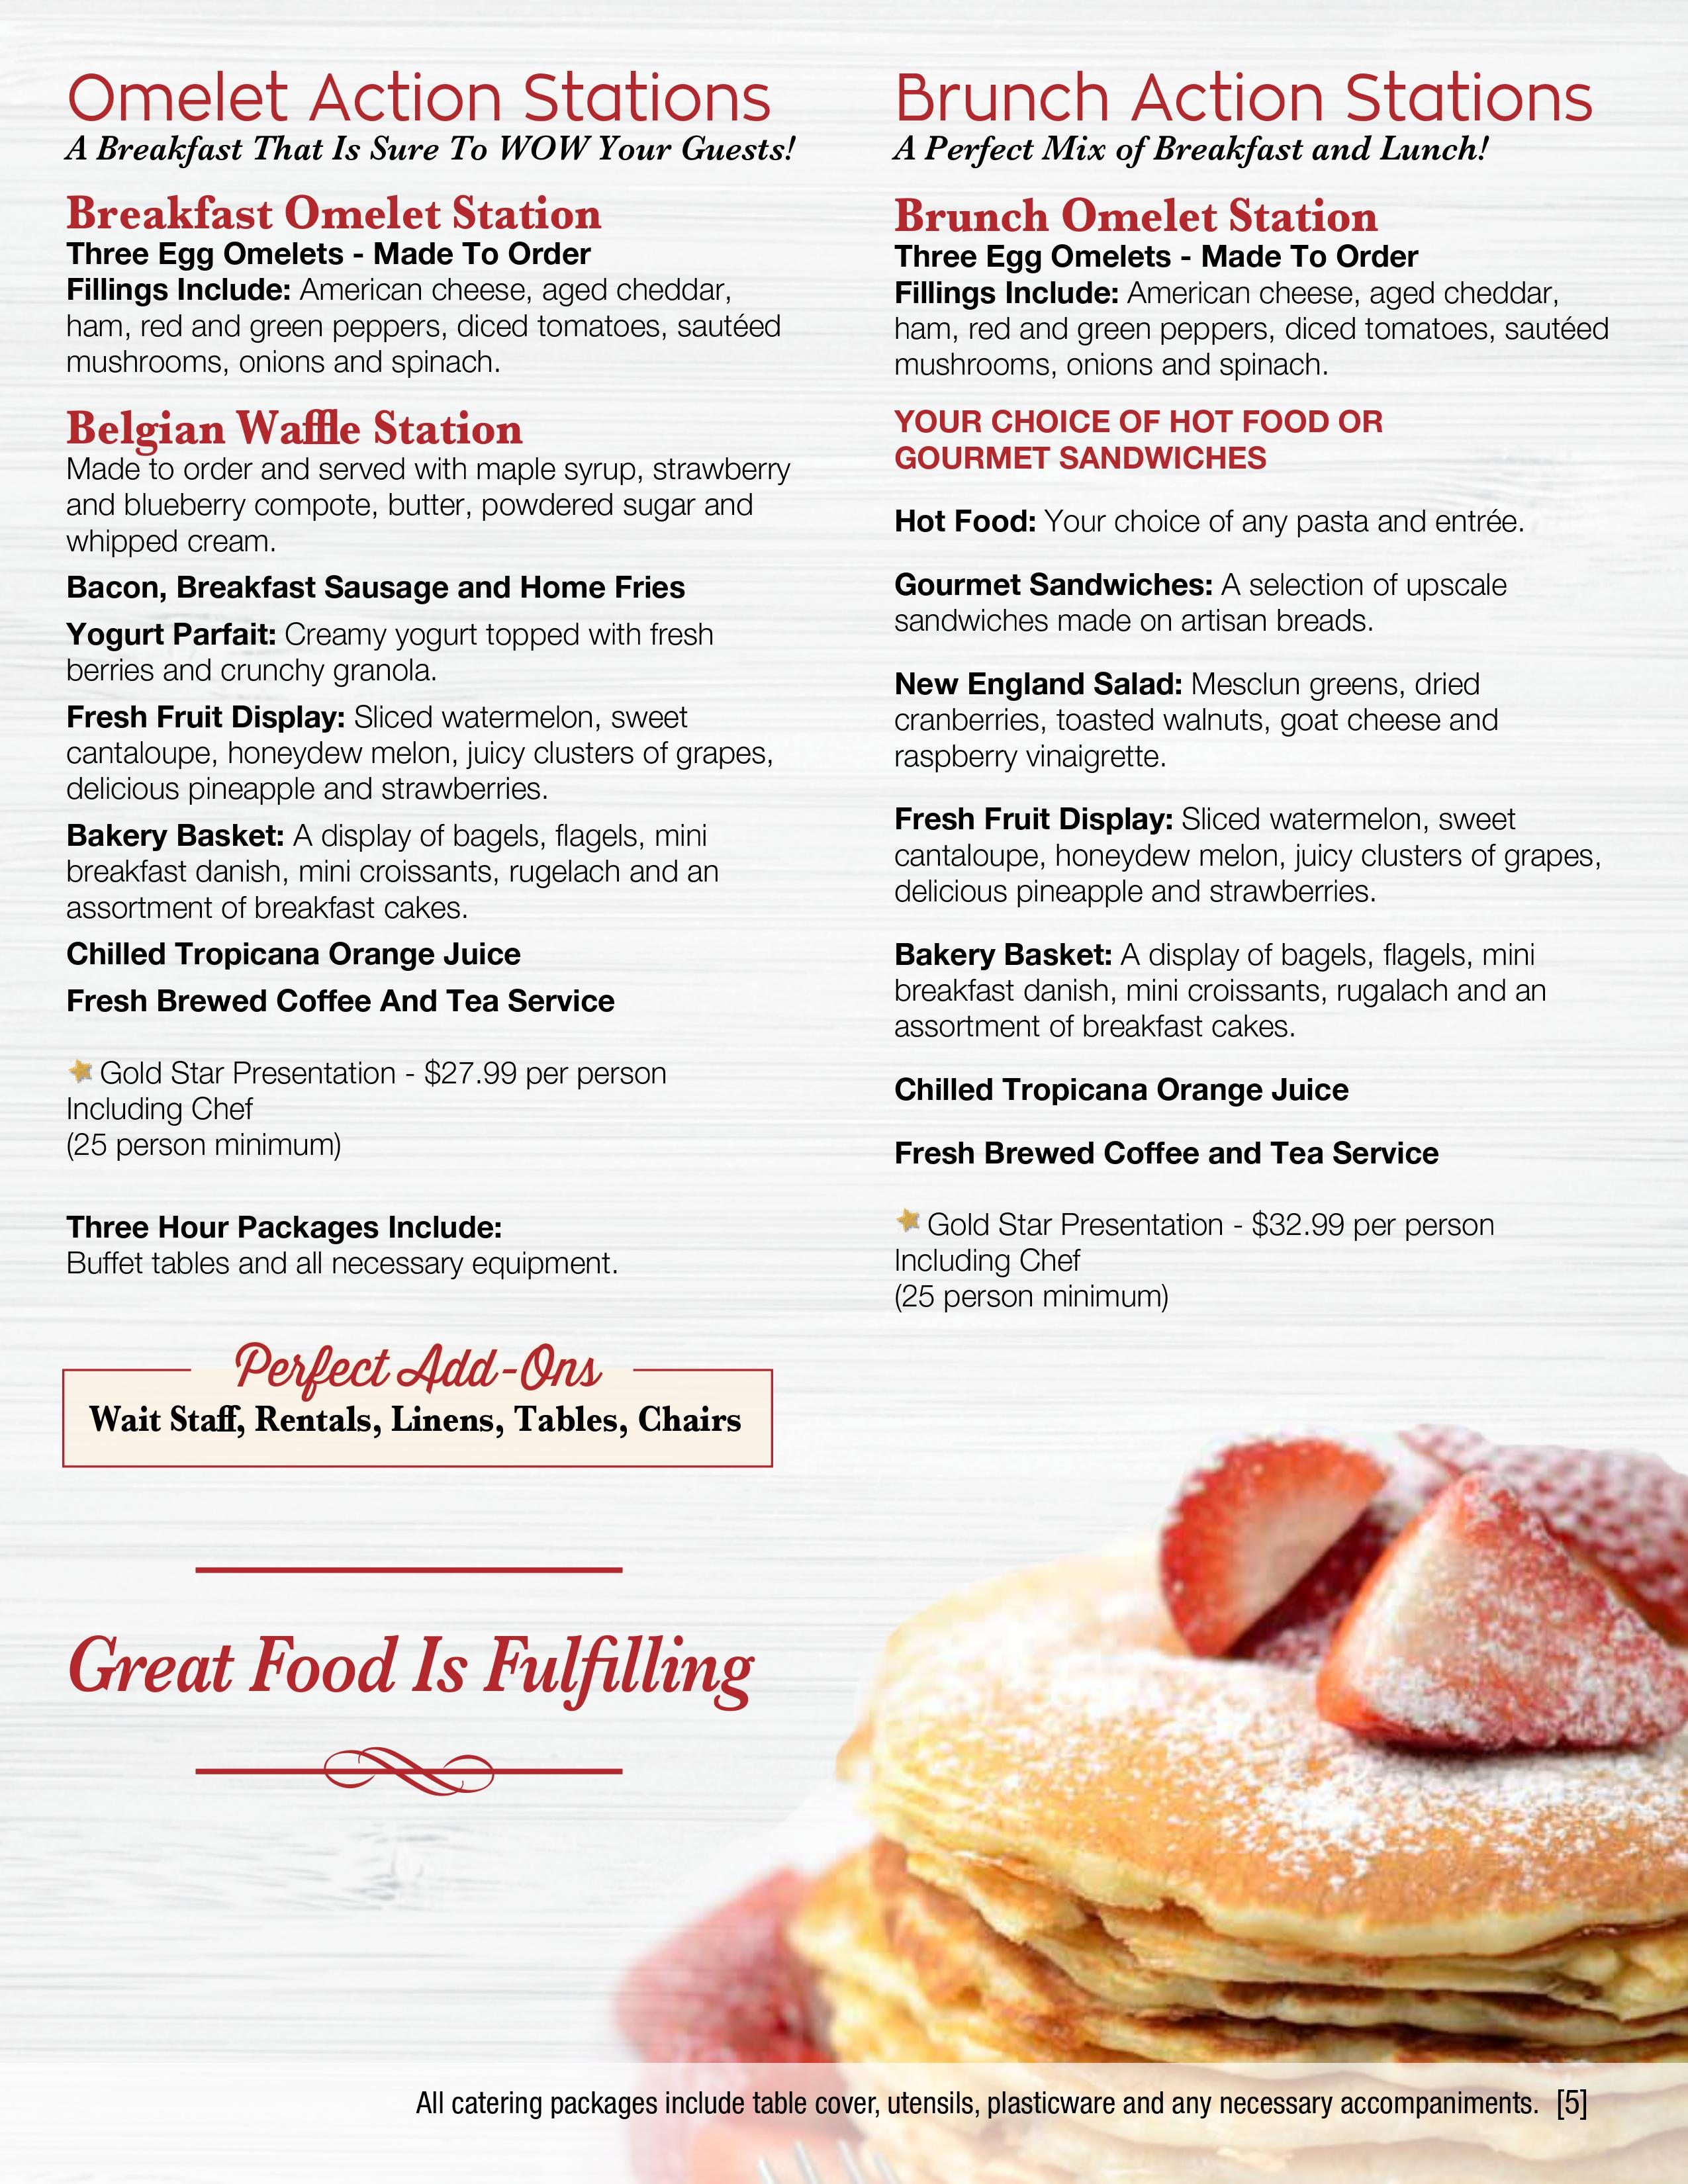 Omelet & Brunch Stations | Coliseum Kitchen & Caterers